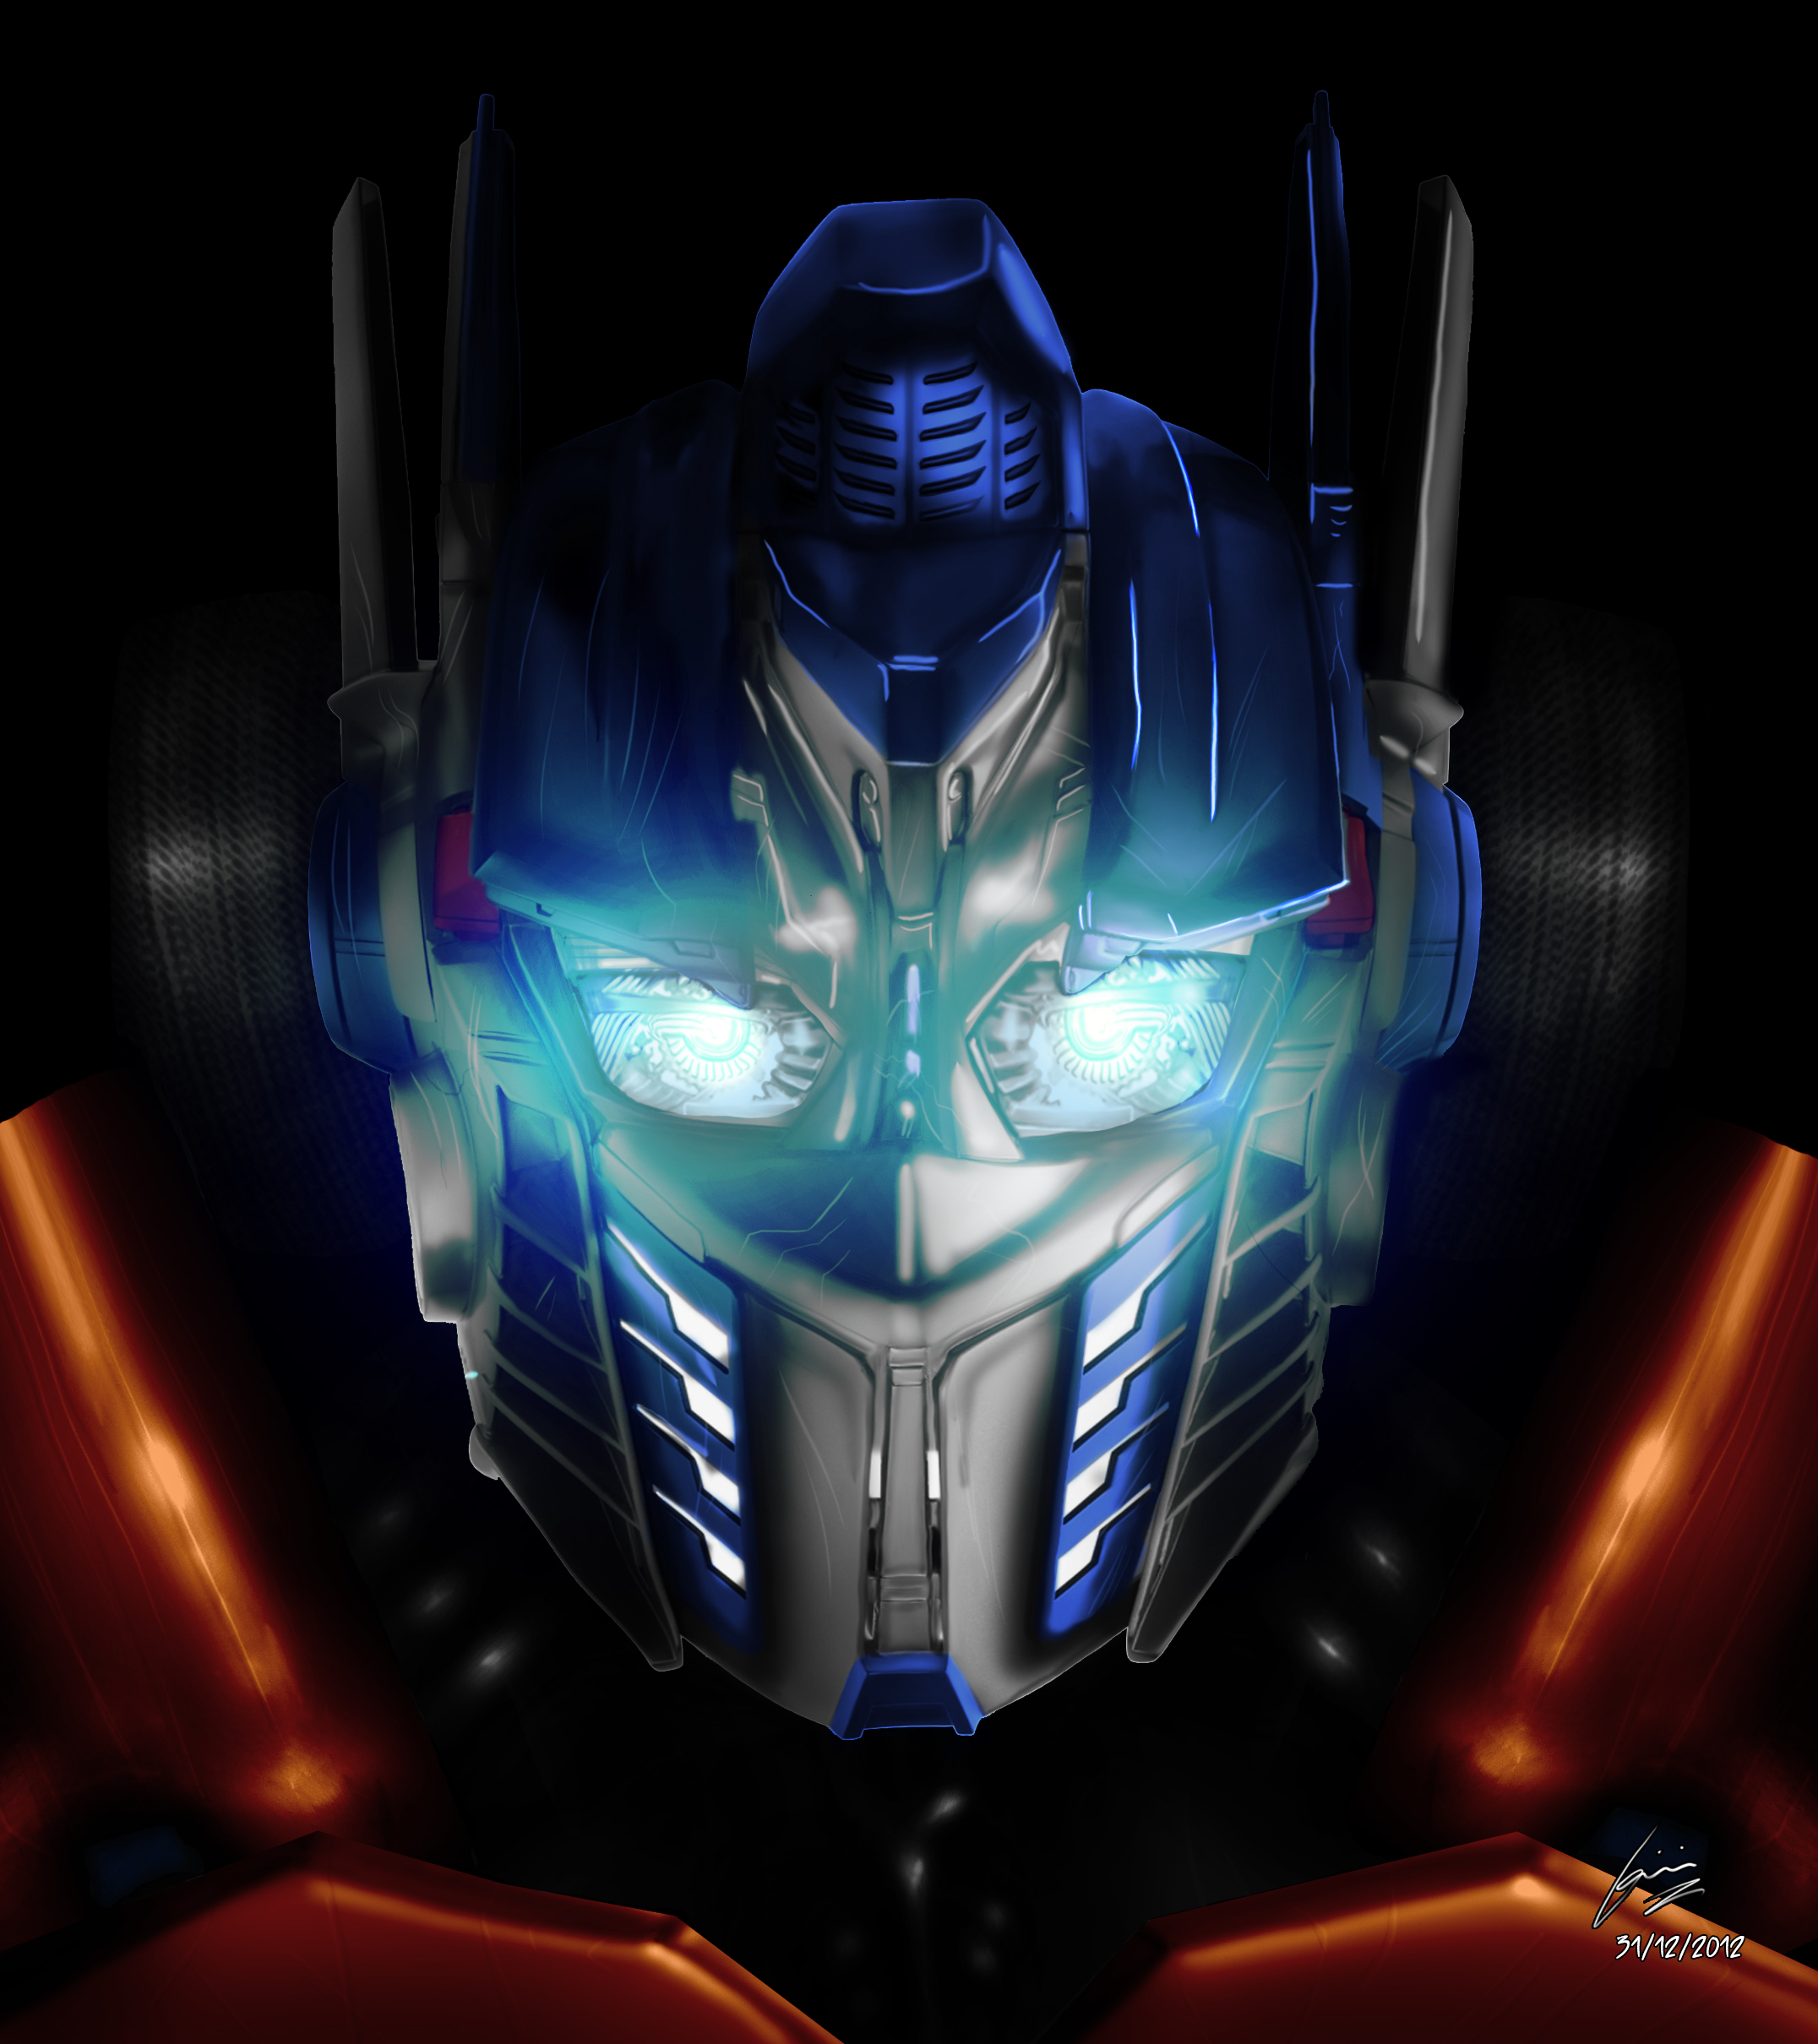 Transformers Optimus Prime Face Painting